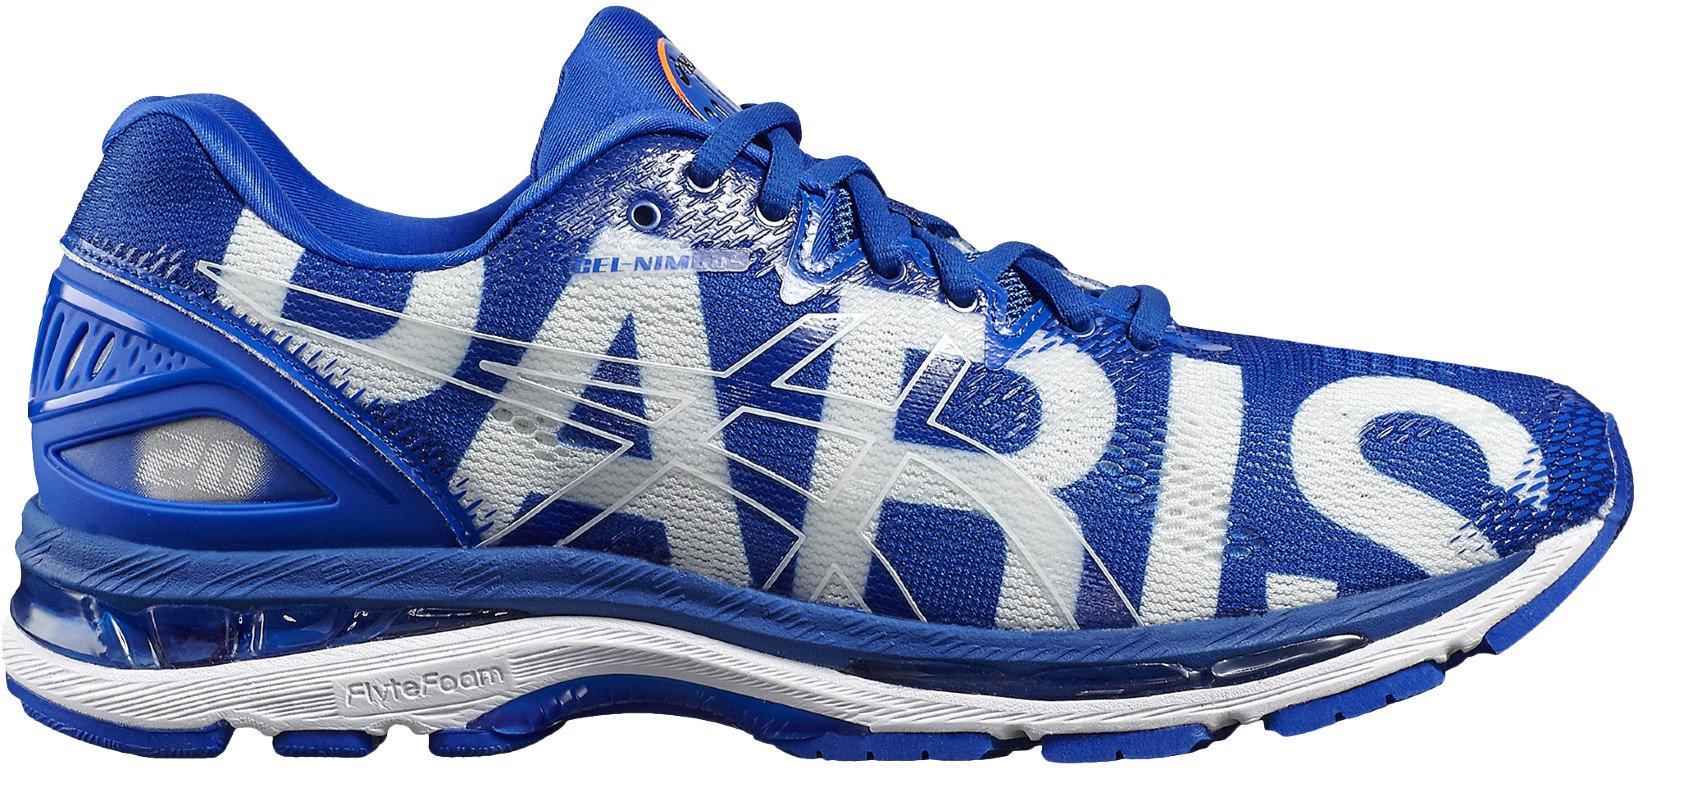 Continuo La cabra Billy el último  Running shoes Asics ASICS GEL-NIMBUS 20 PARIS - Top4Running.com